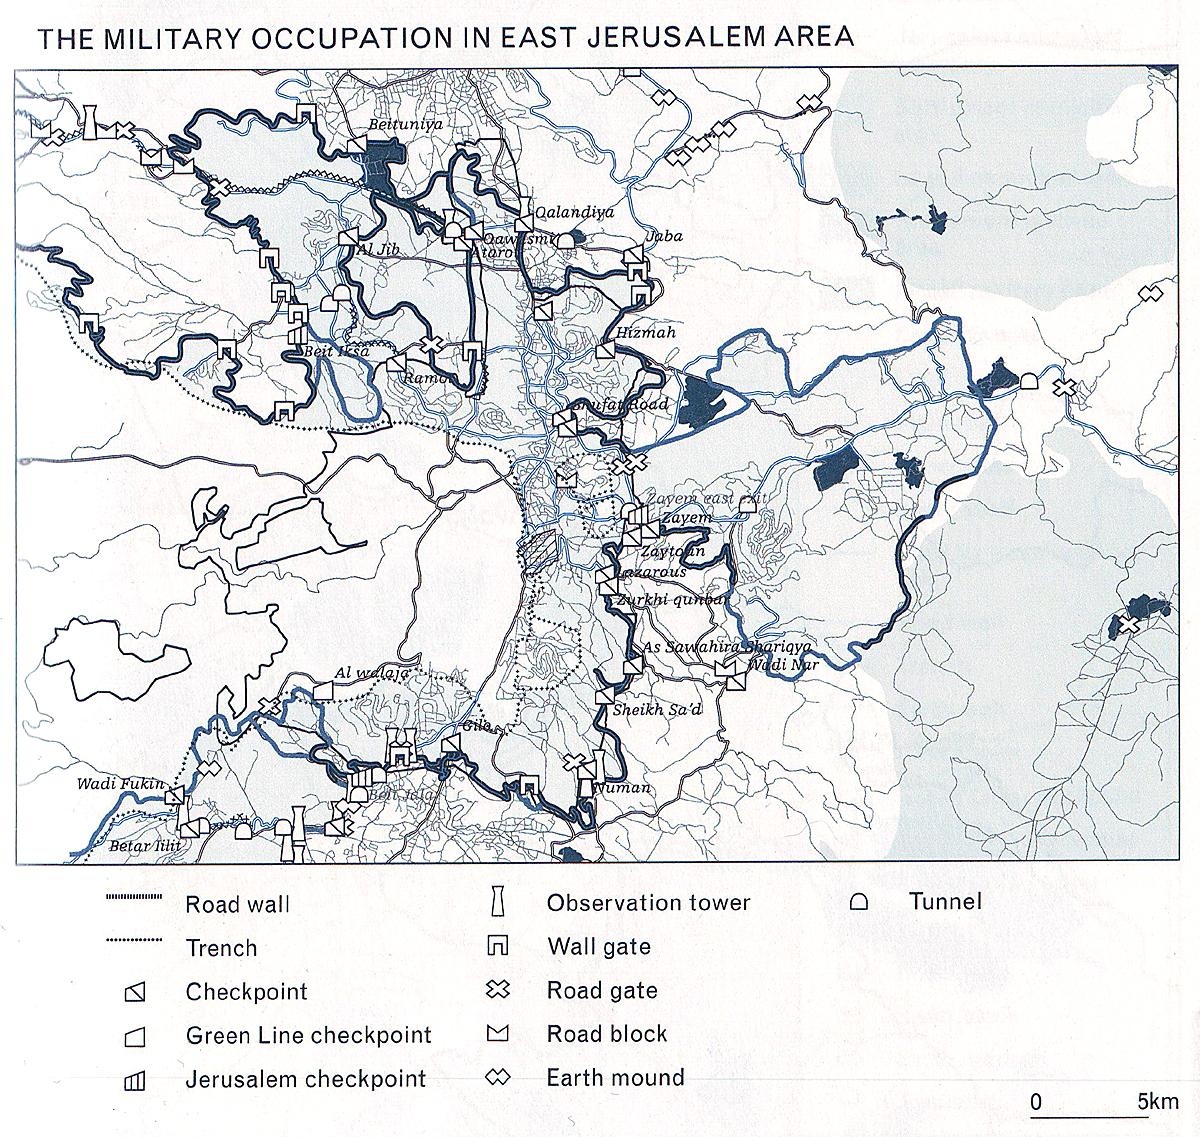 bezet gebied israel